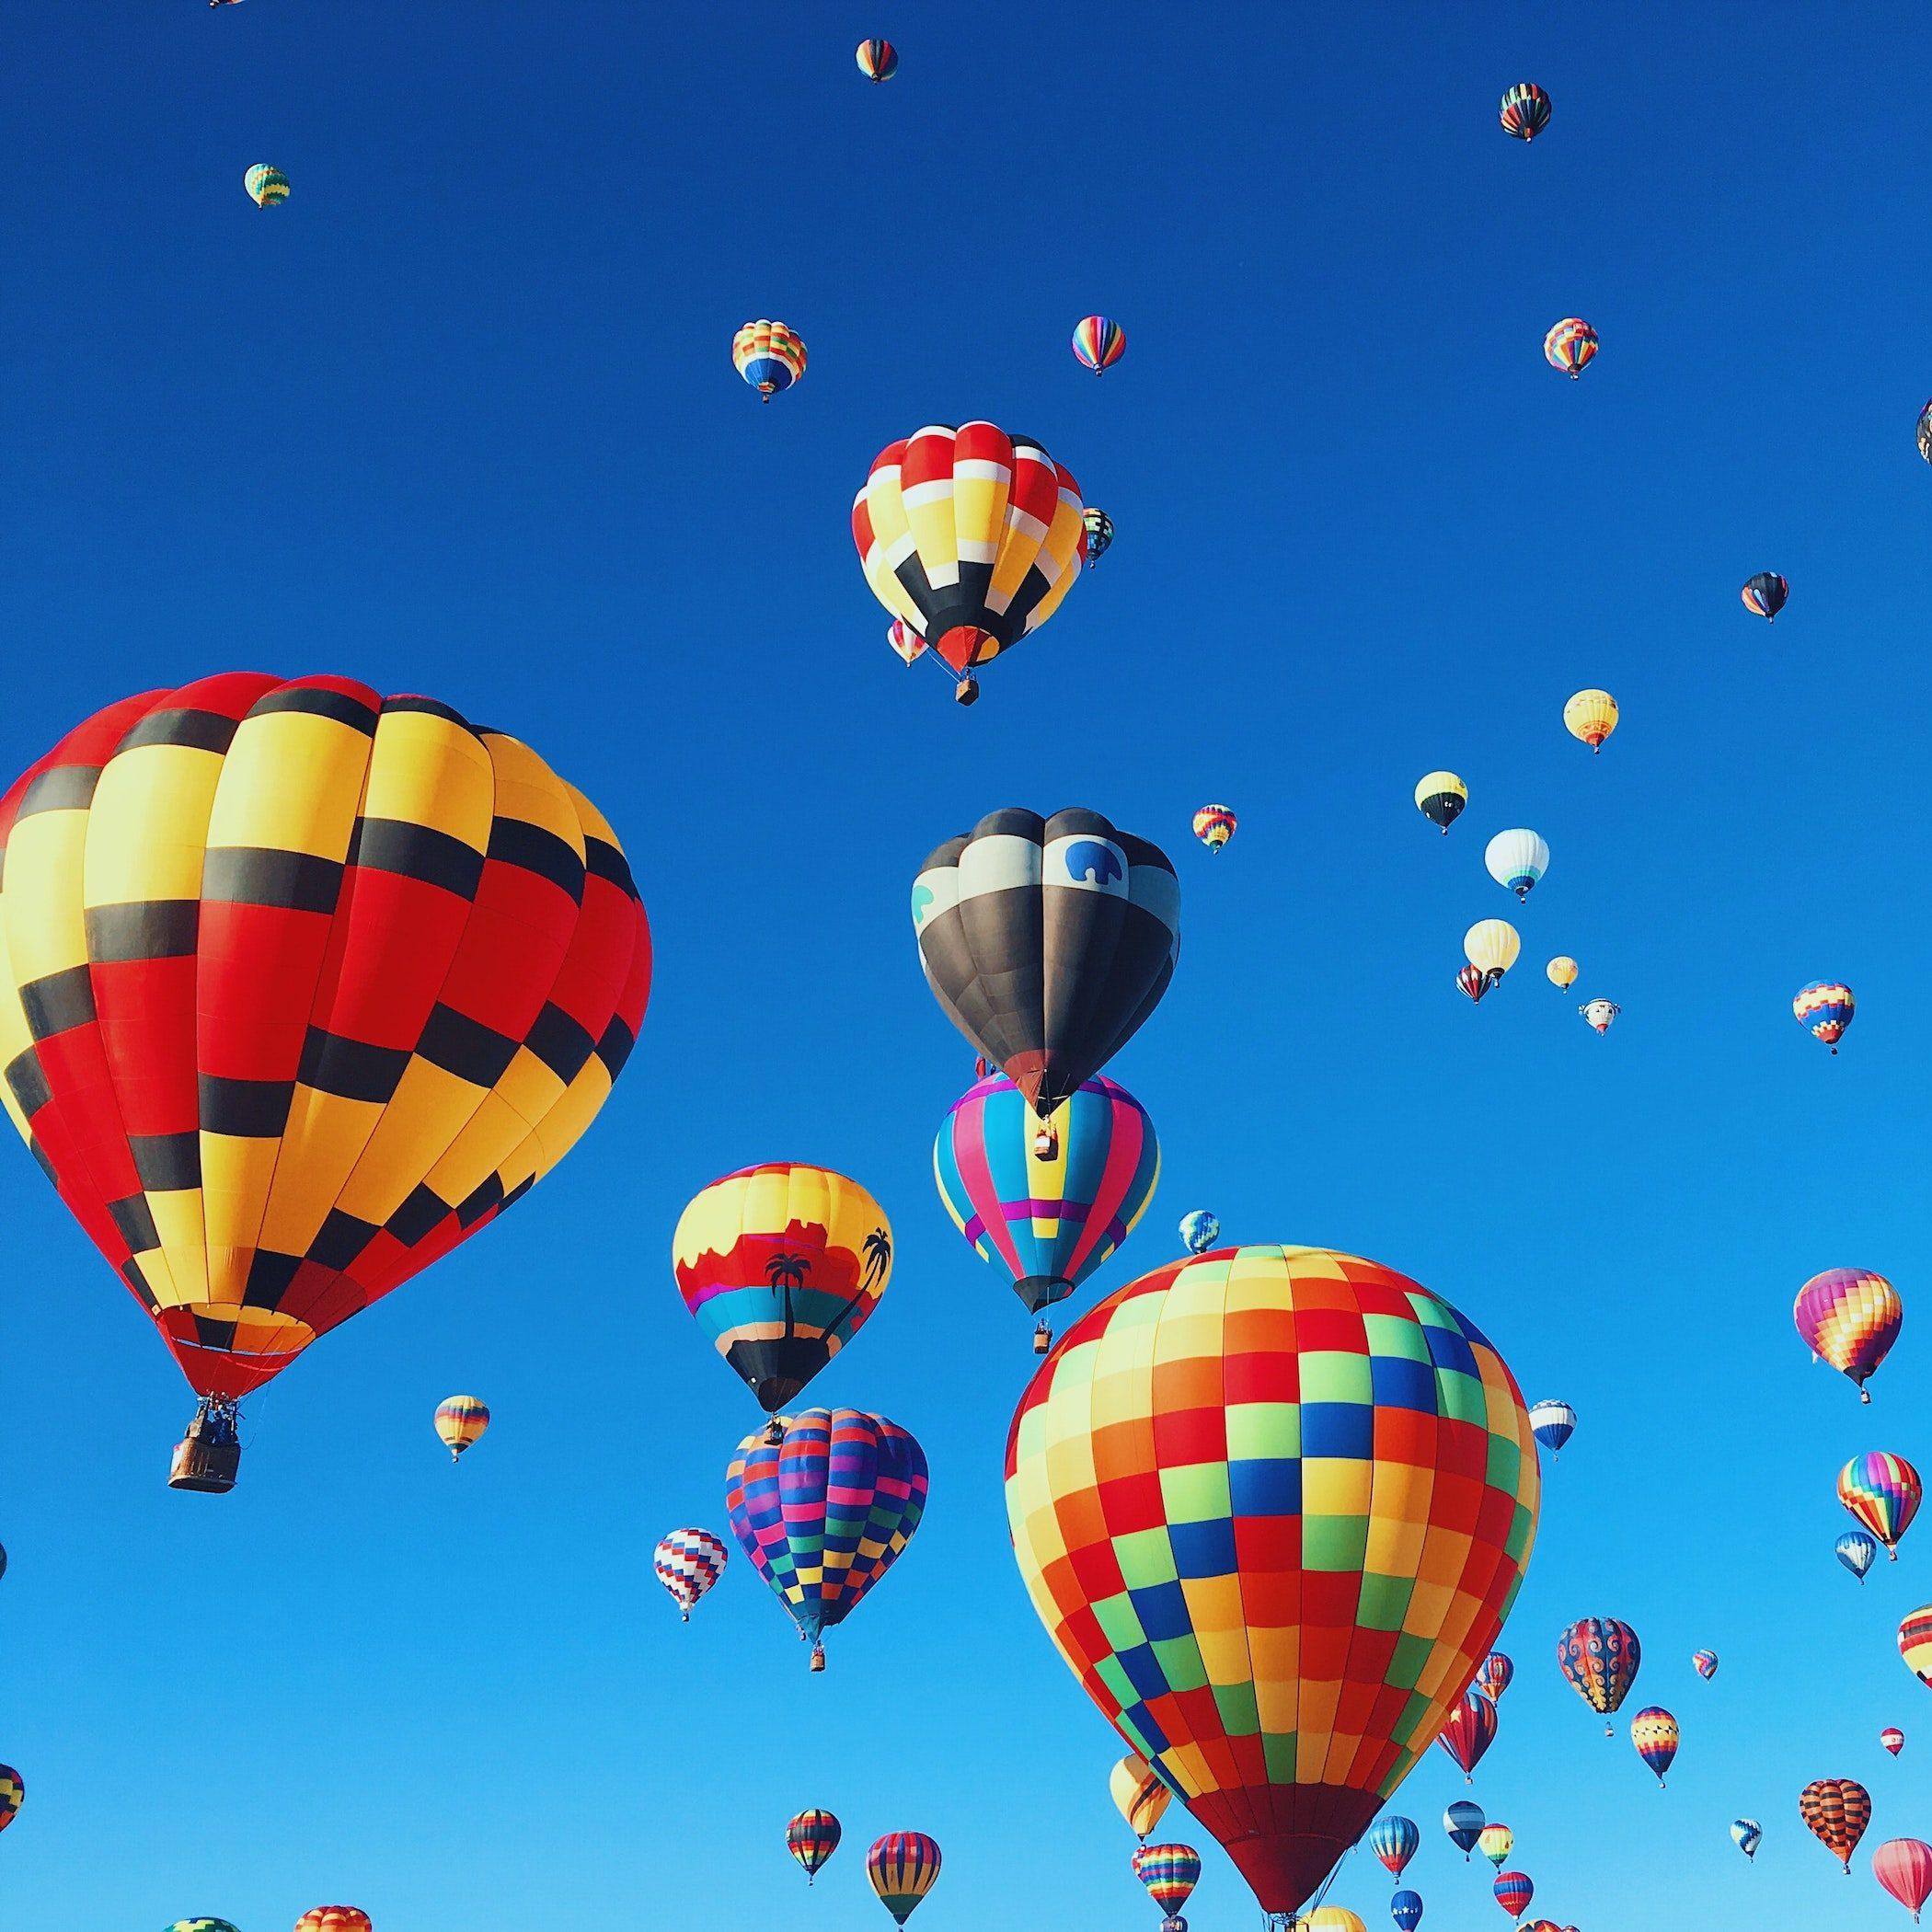 hot-air-balloons-building-hope